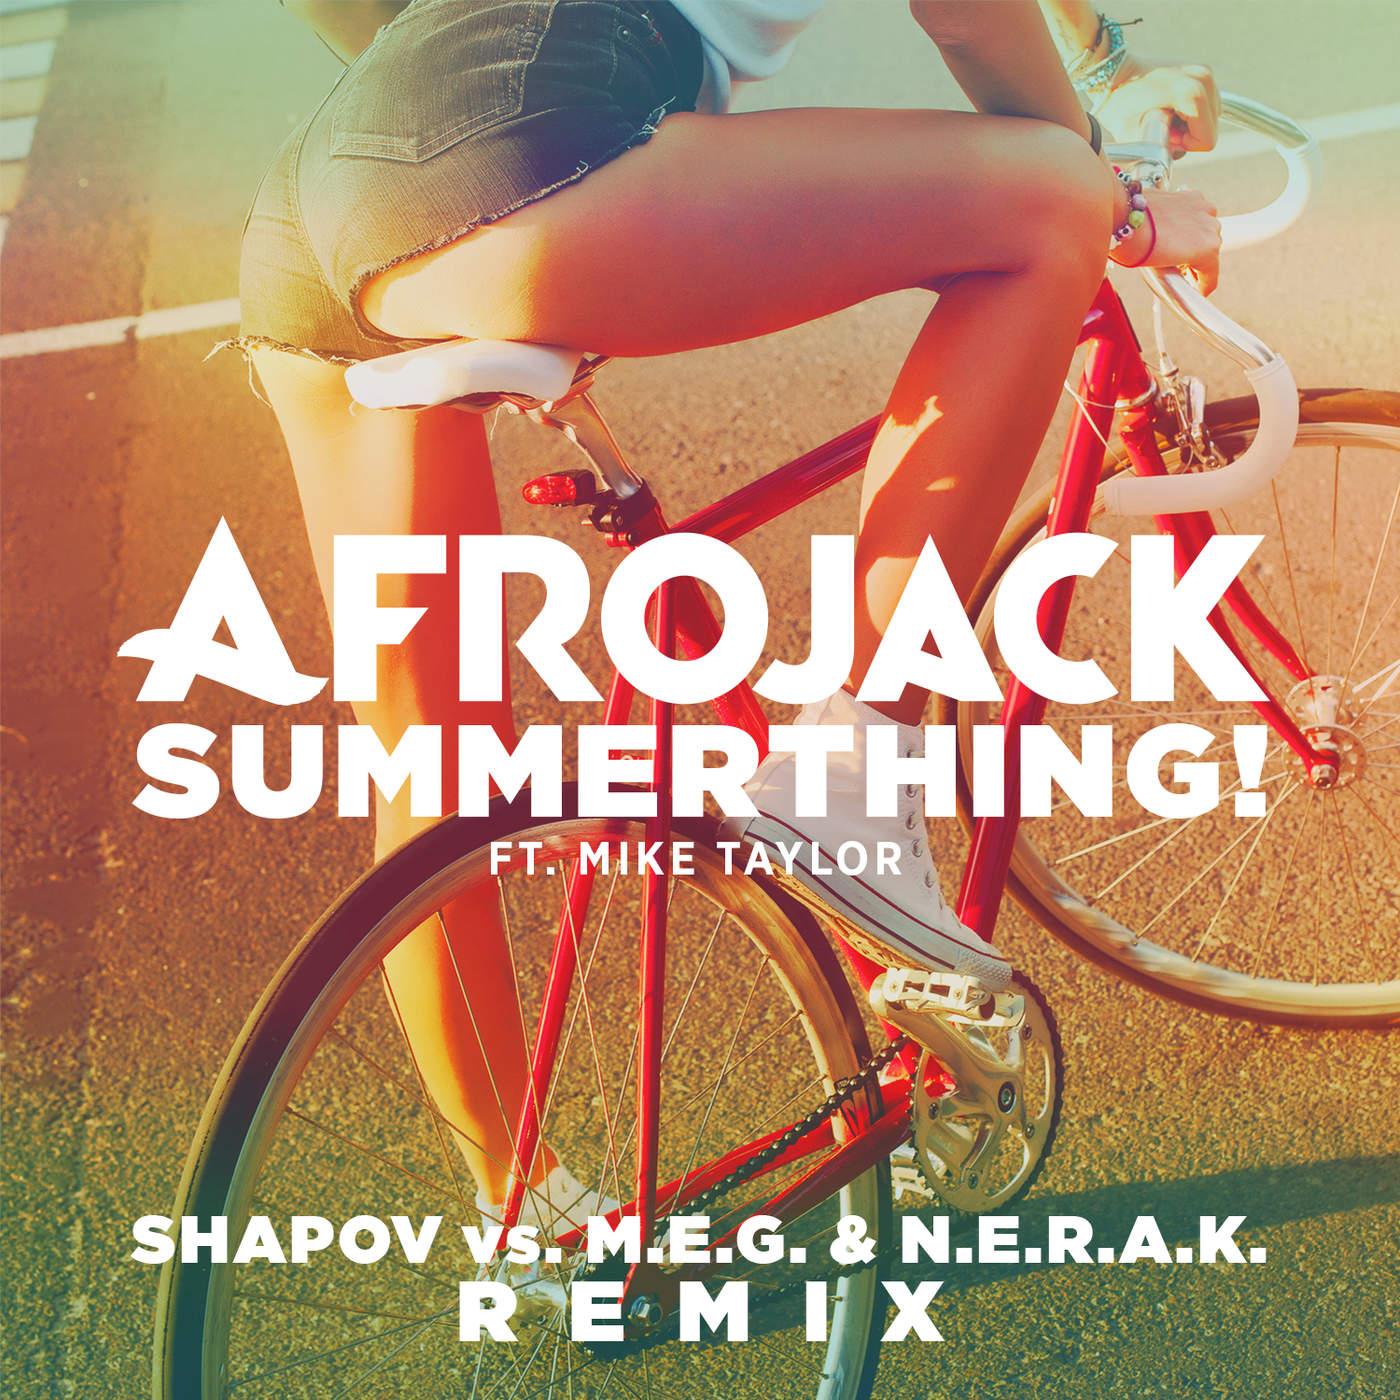 SummerThing! (feat. Mike Taylor) (Shapov vs. M.E.G. & N.E.R.A.K. Remix)